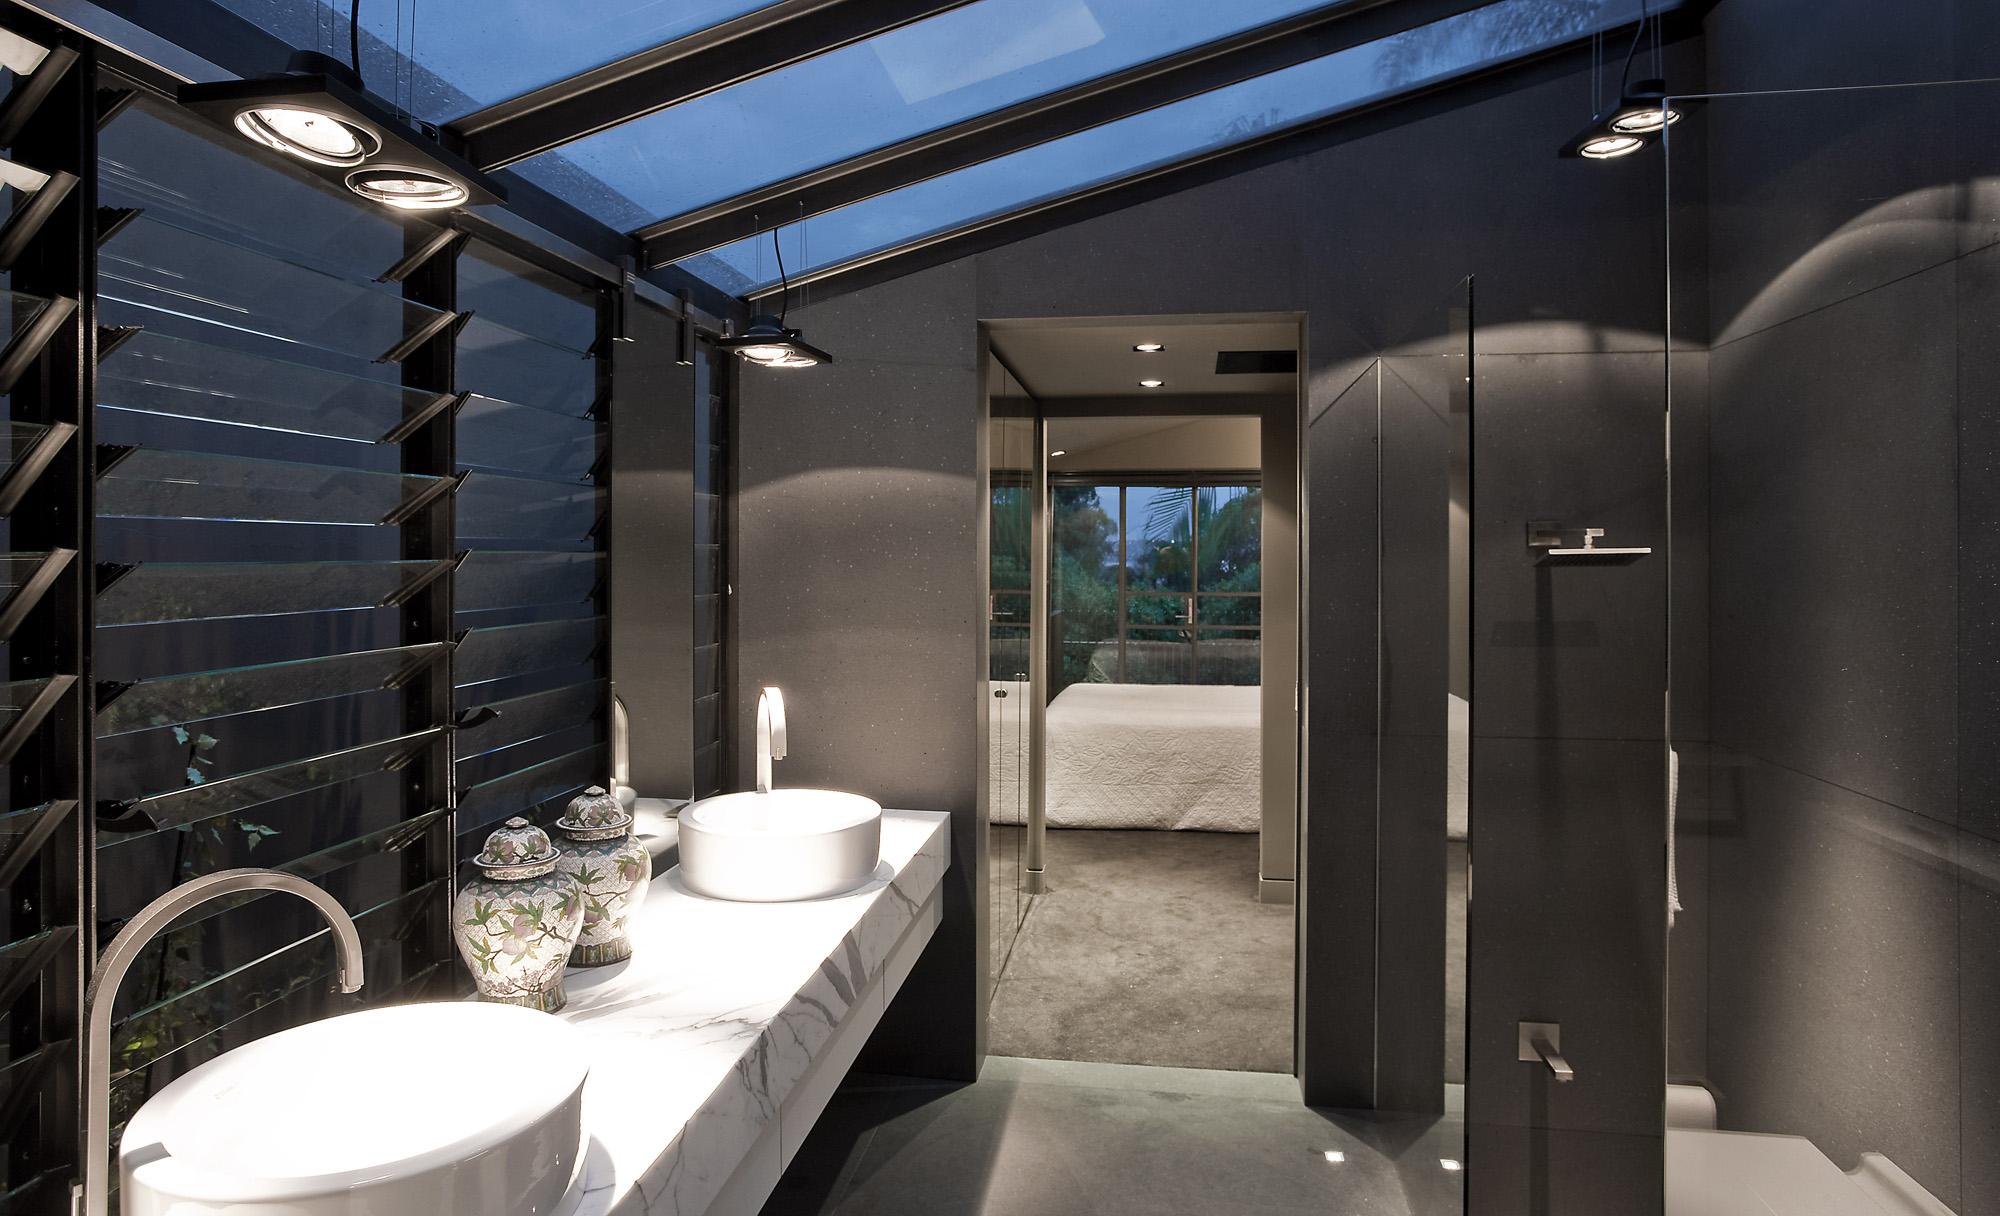 Gurner Street Paddington bathroom low res.jpg